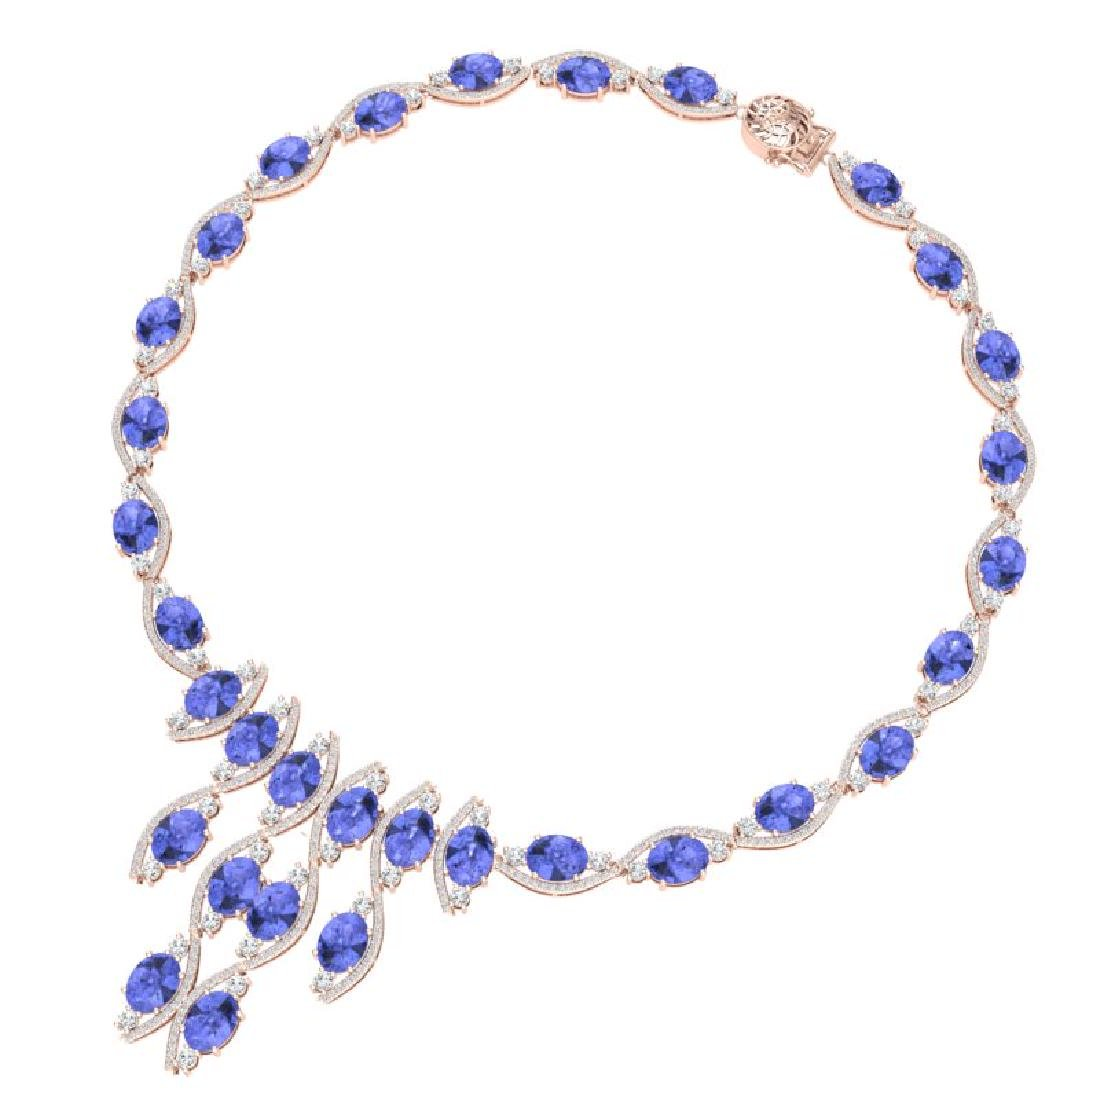 65.60 CTW Royalty Tanzanite & VS Diamond Necklace 18K - 3